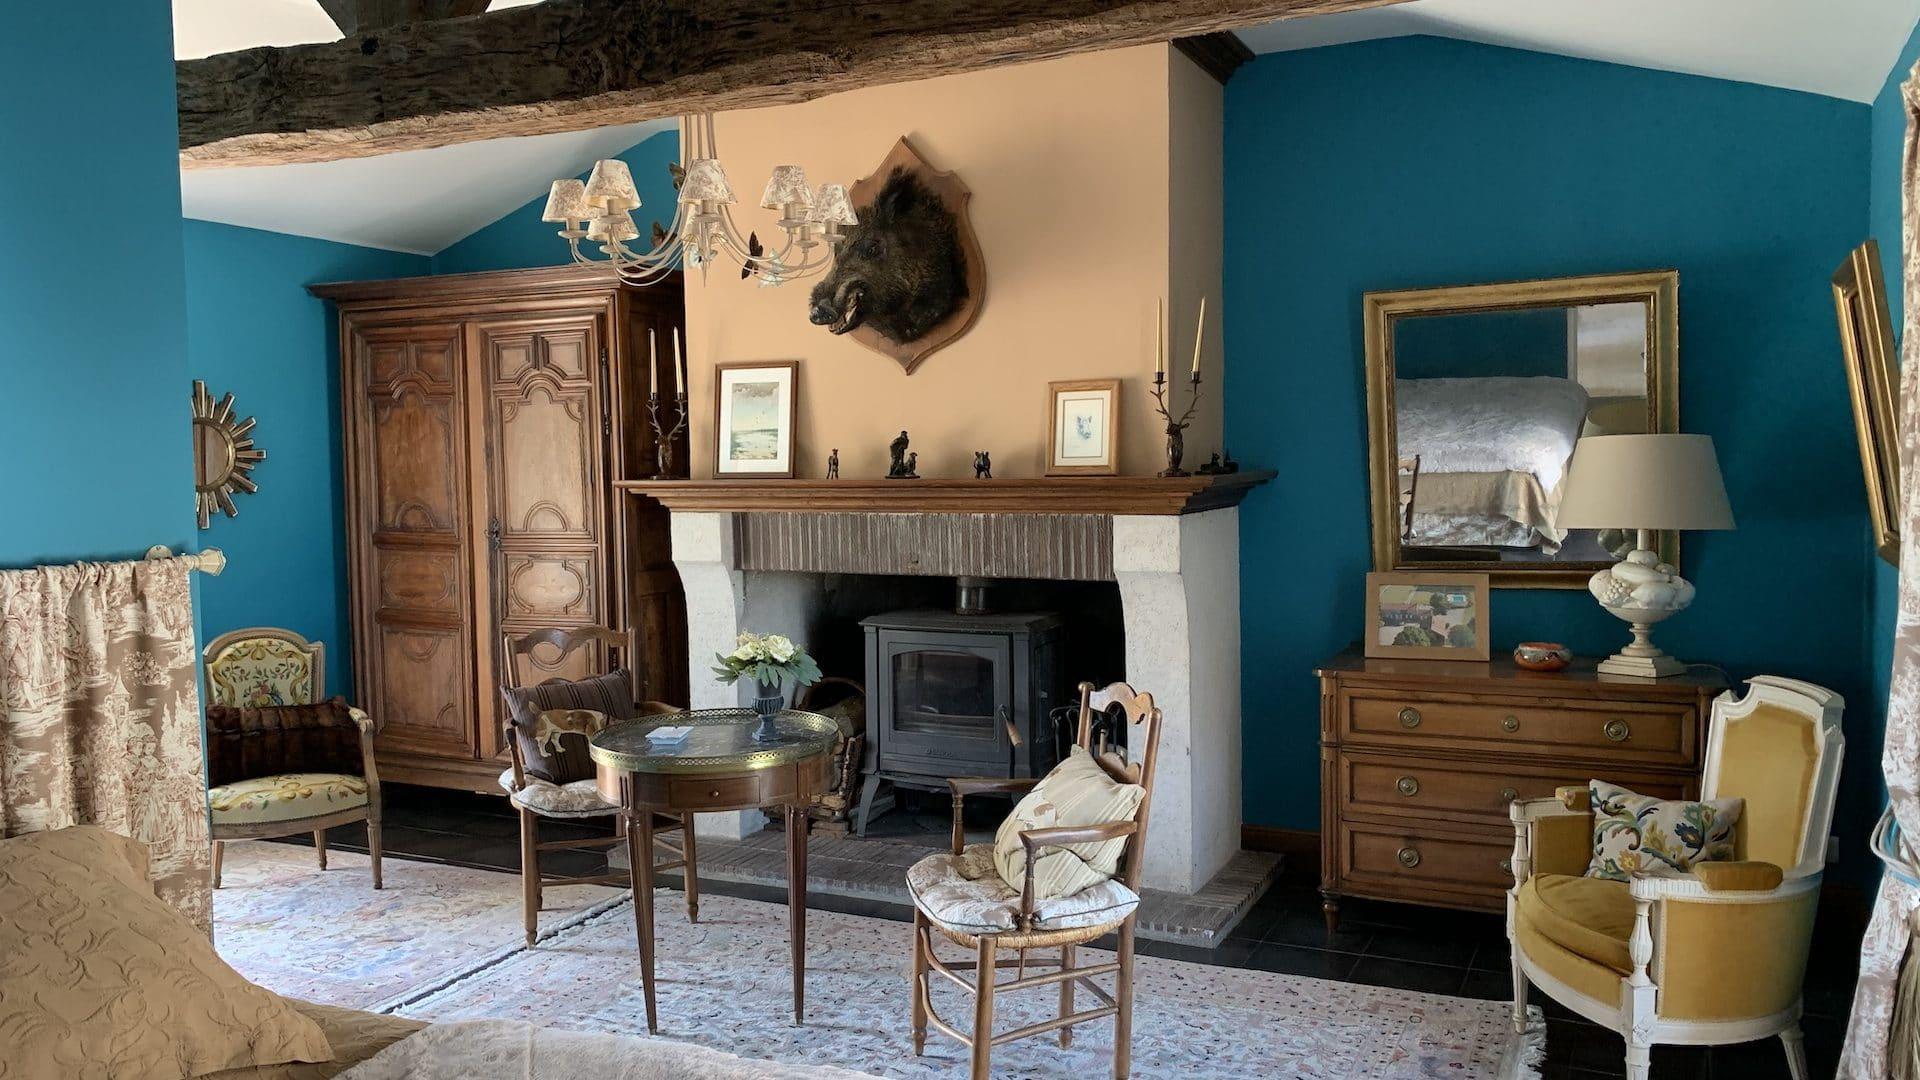 Les Béchis turquoise room